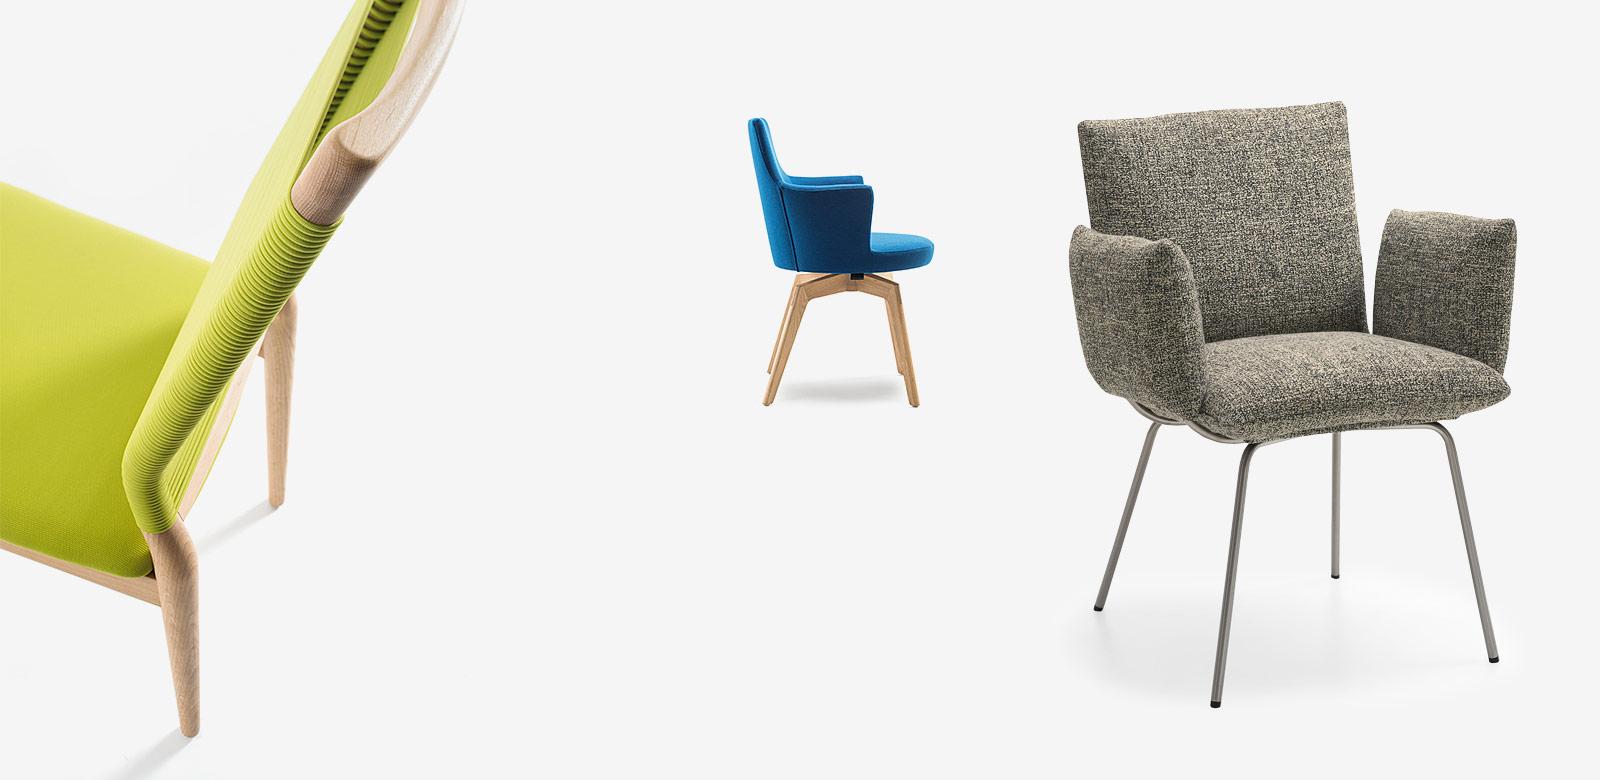 stuhl leder edelstahl ikea gallery of ikea sessel stuhl barhocker neuwertig with stuhl leder. Black Bedroom Furniture Sets. Home Design Ideas